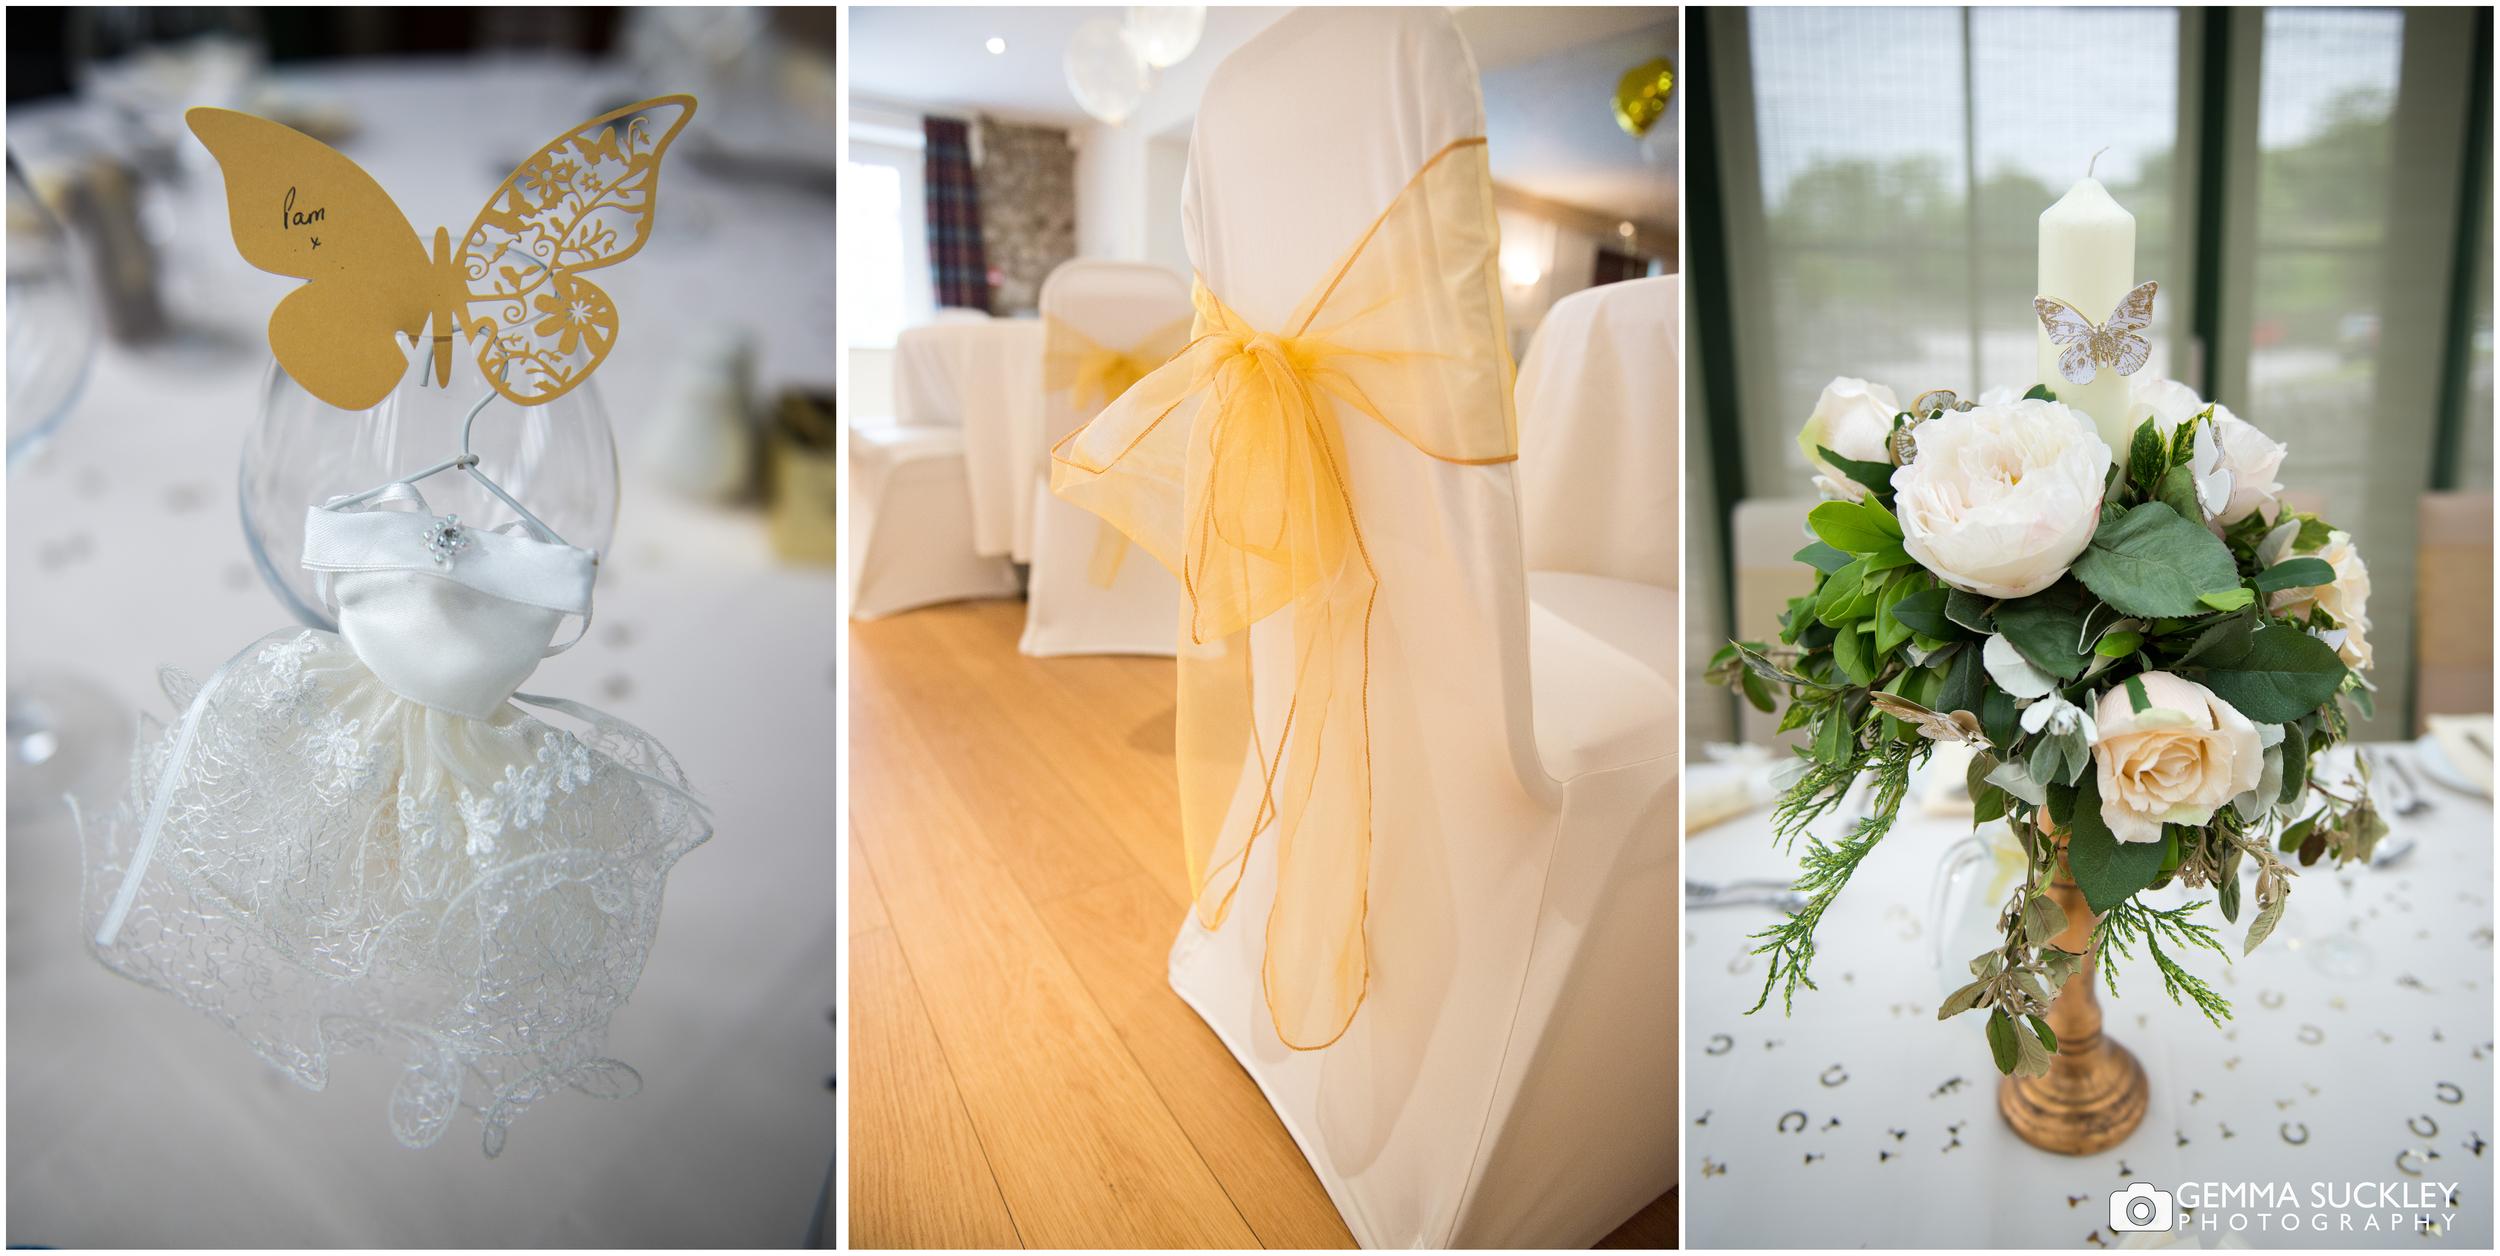 Wedding detail at the gameskeeper inn